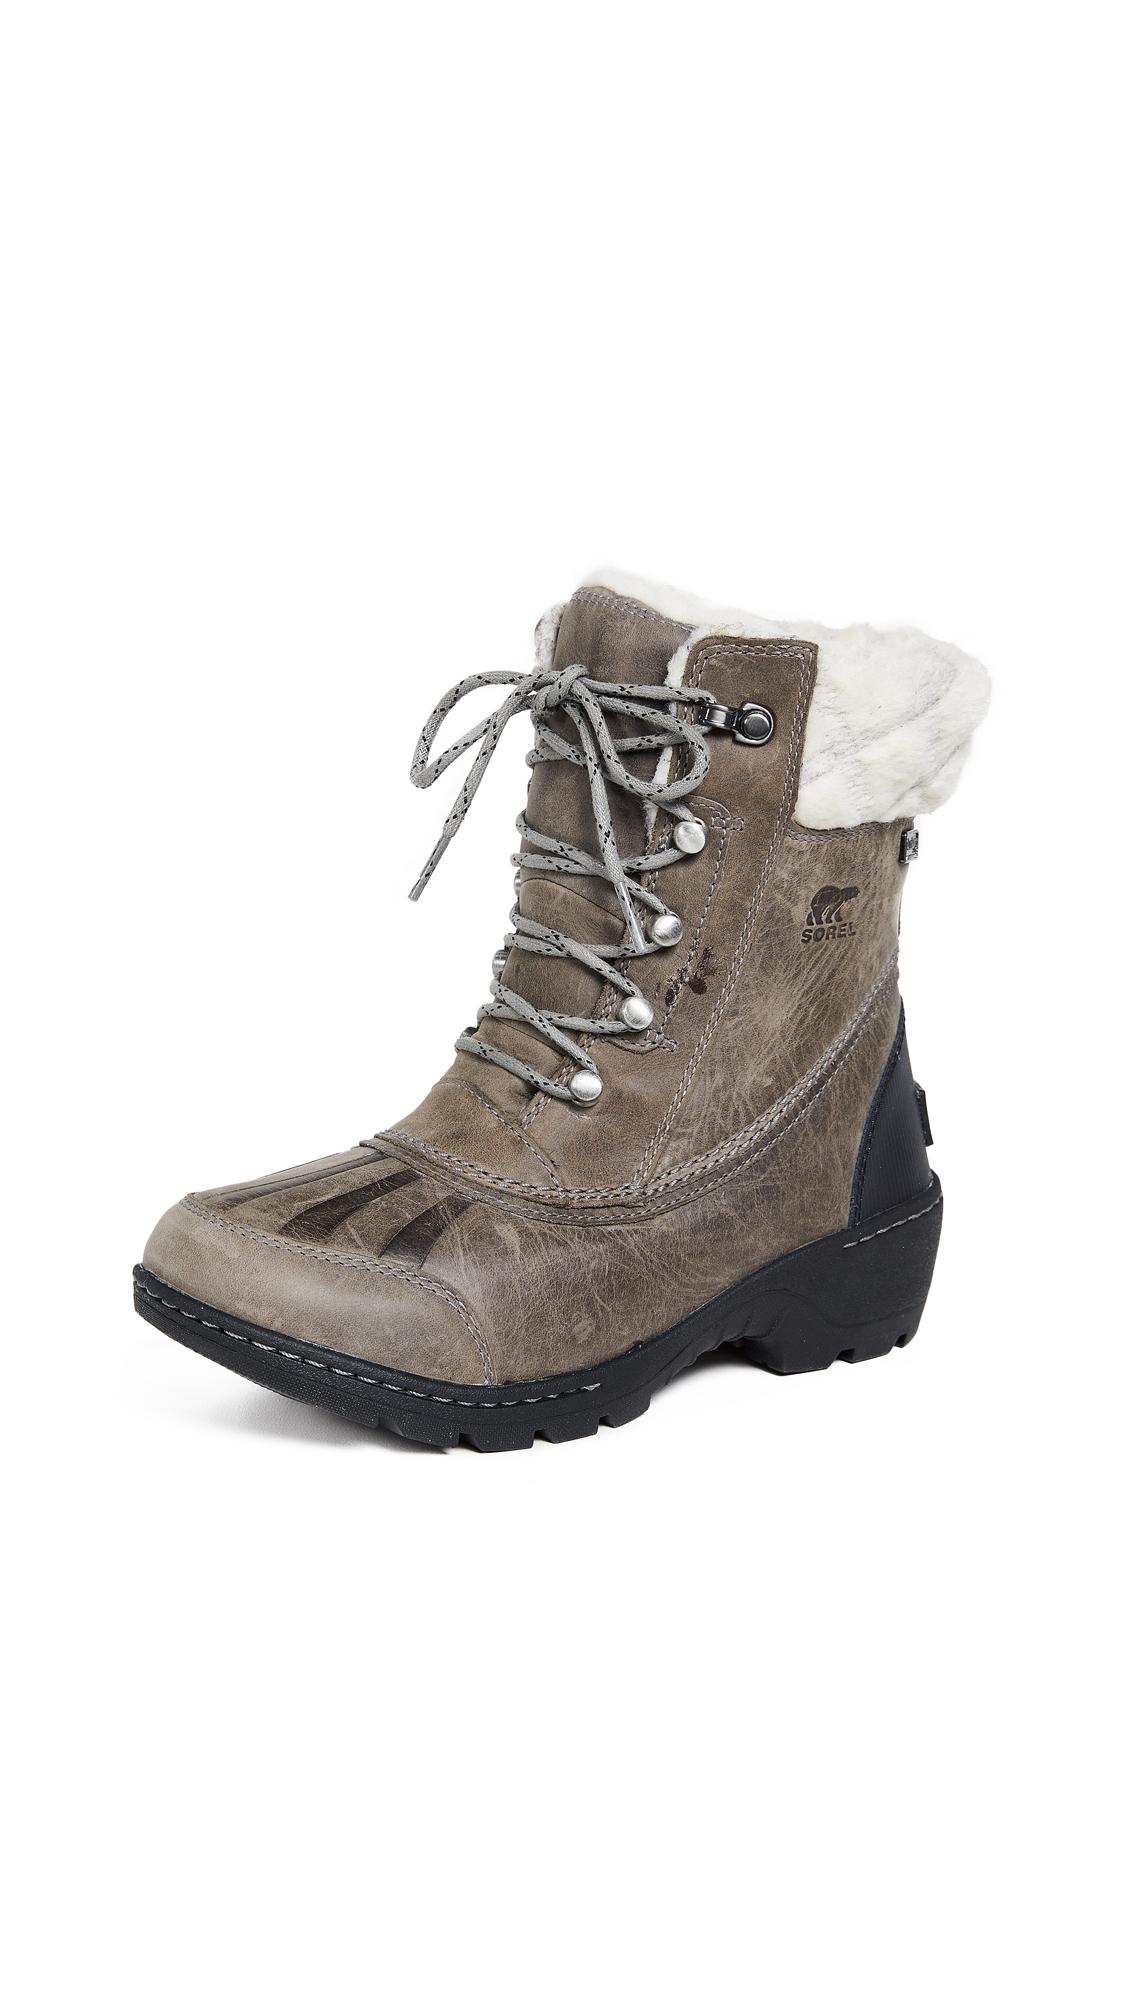 Sorel Whistler Mid Boots - Quarry/Black